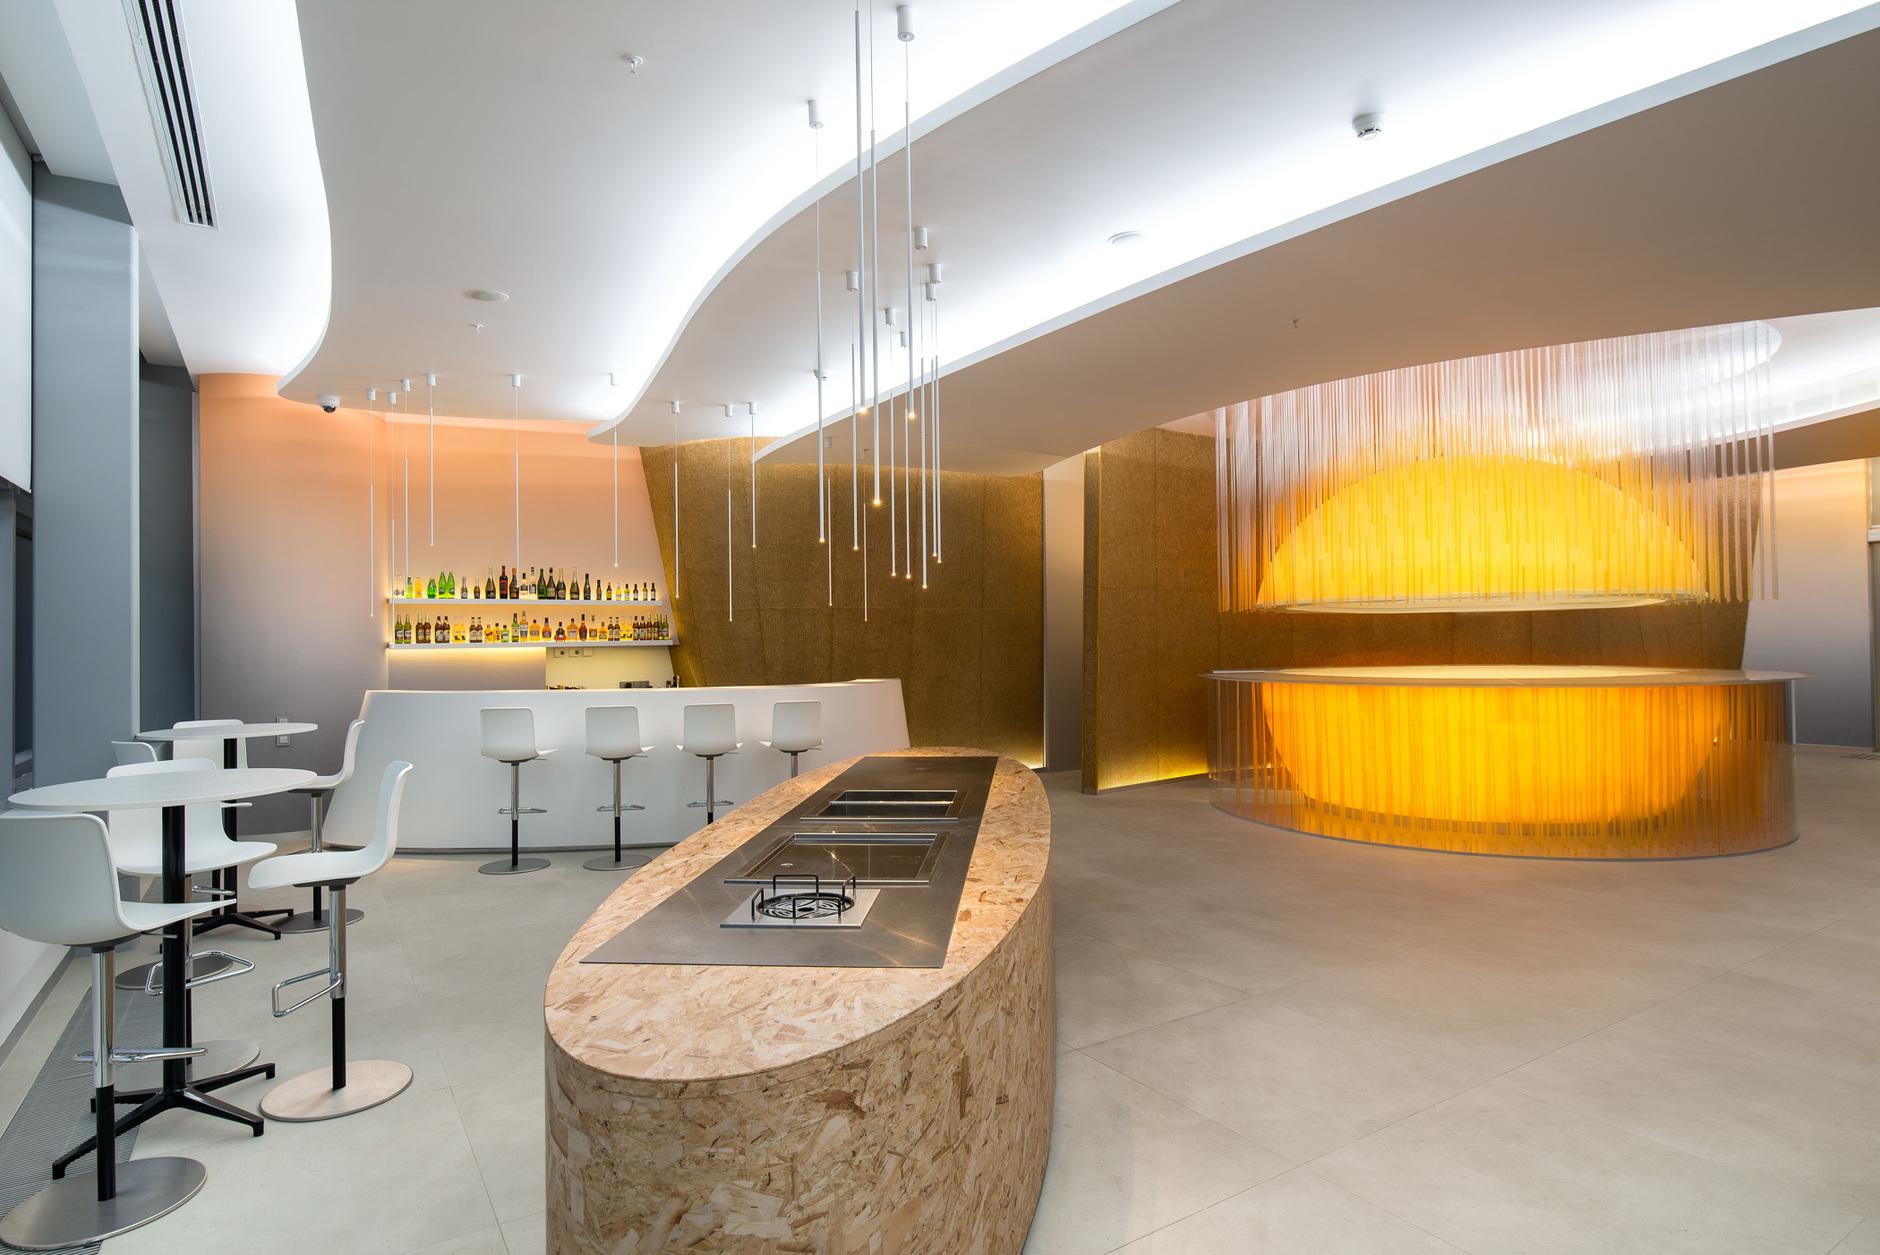 Бизнес-лаунж аэропорта «Платов» в Ростове-на-Дону: проект VOX Architects (галерея 9, фото 2)